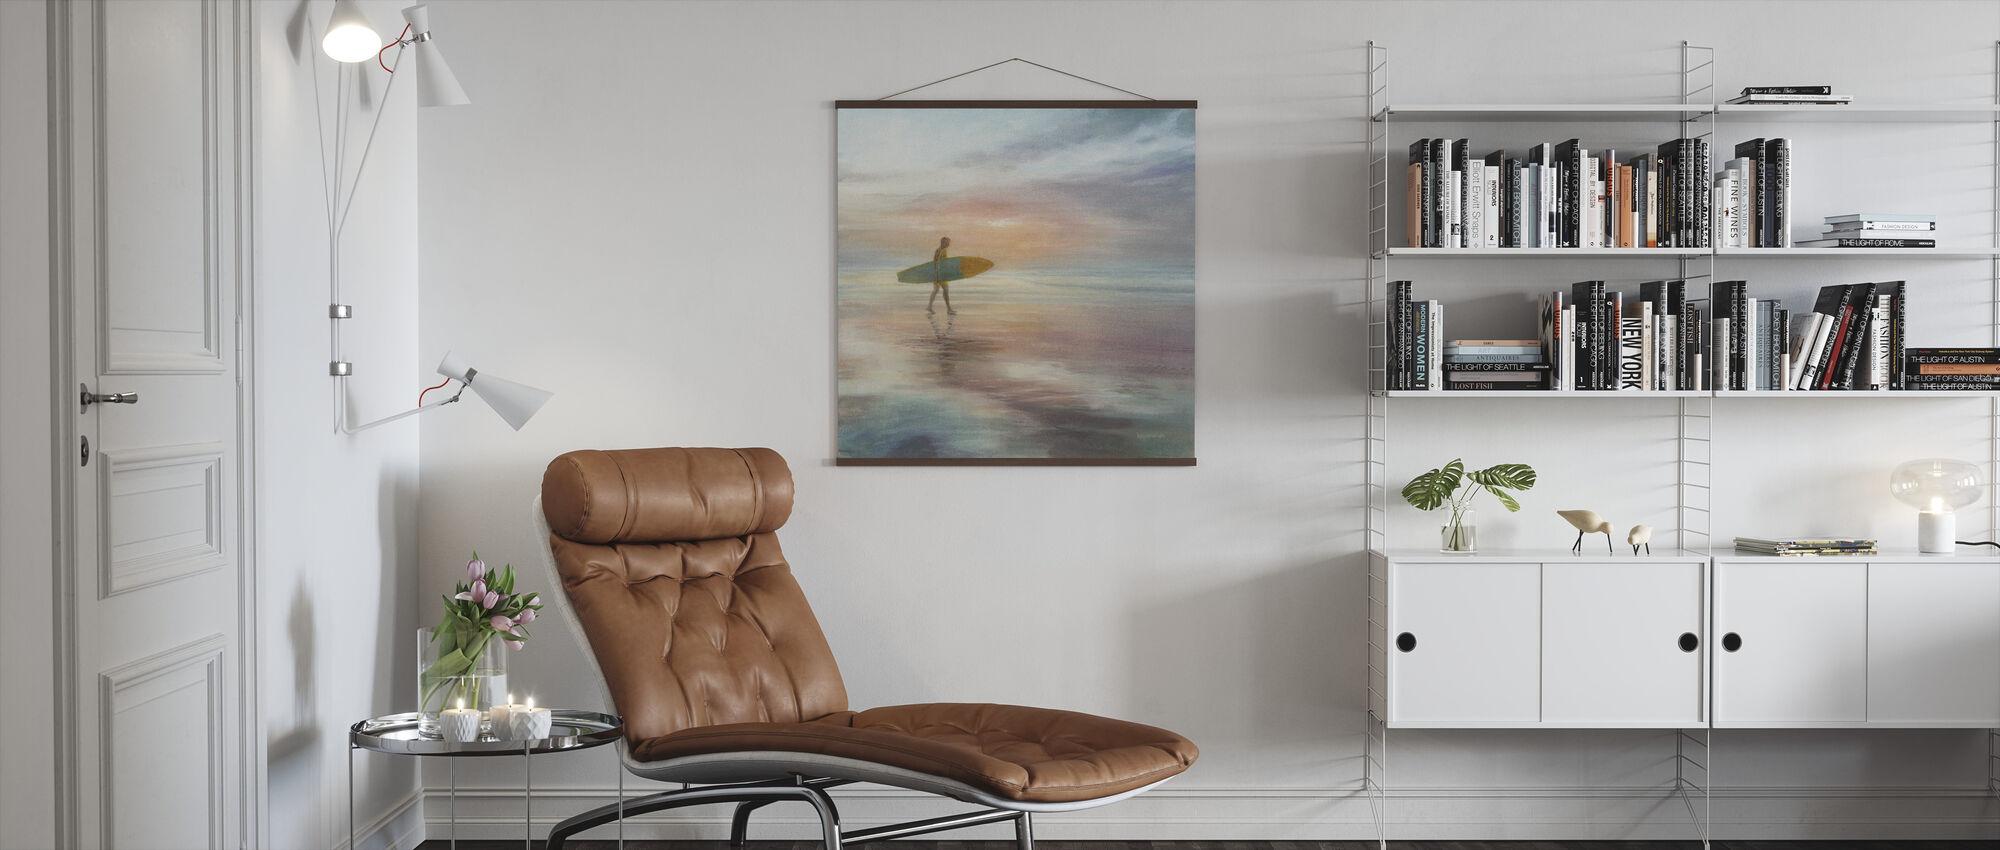 Surfside - Poster - Living Room